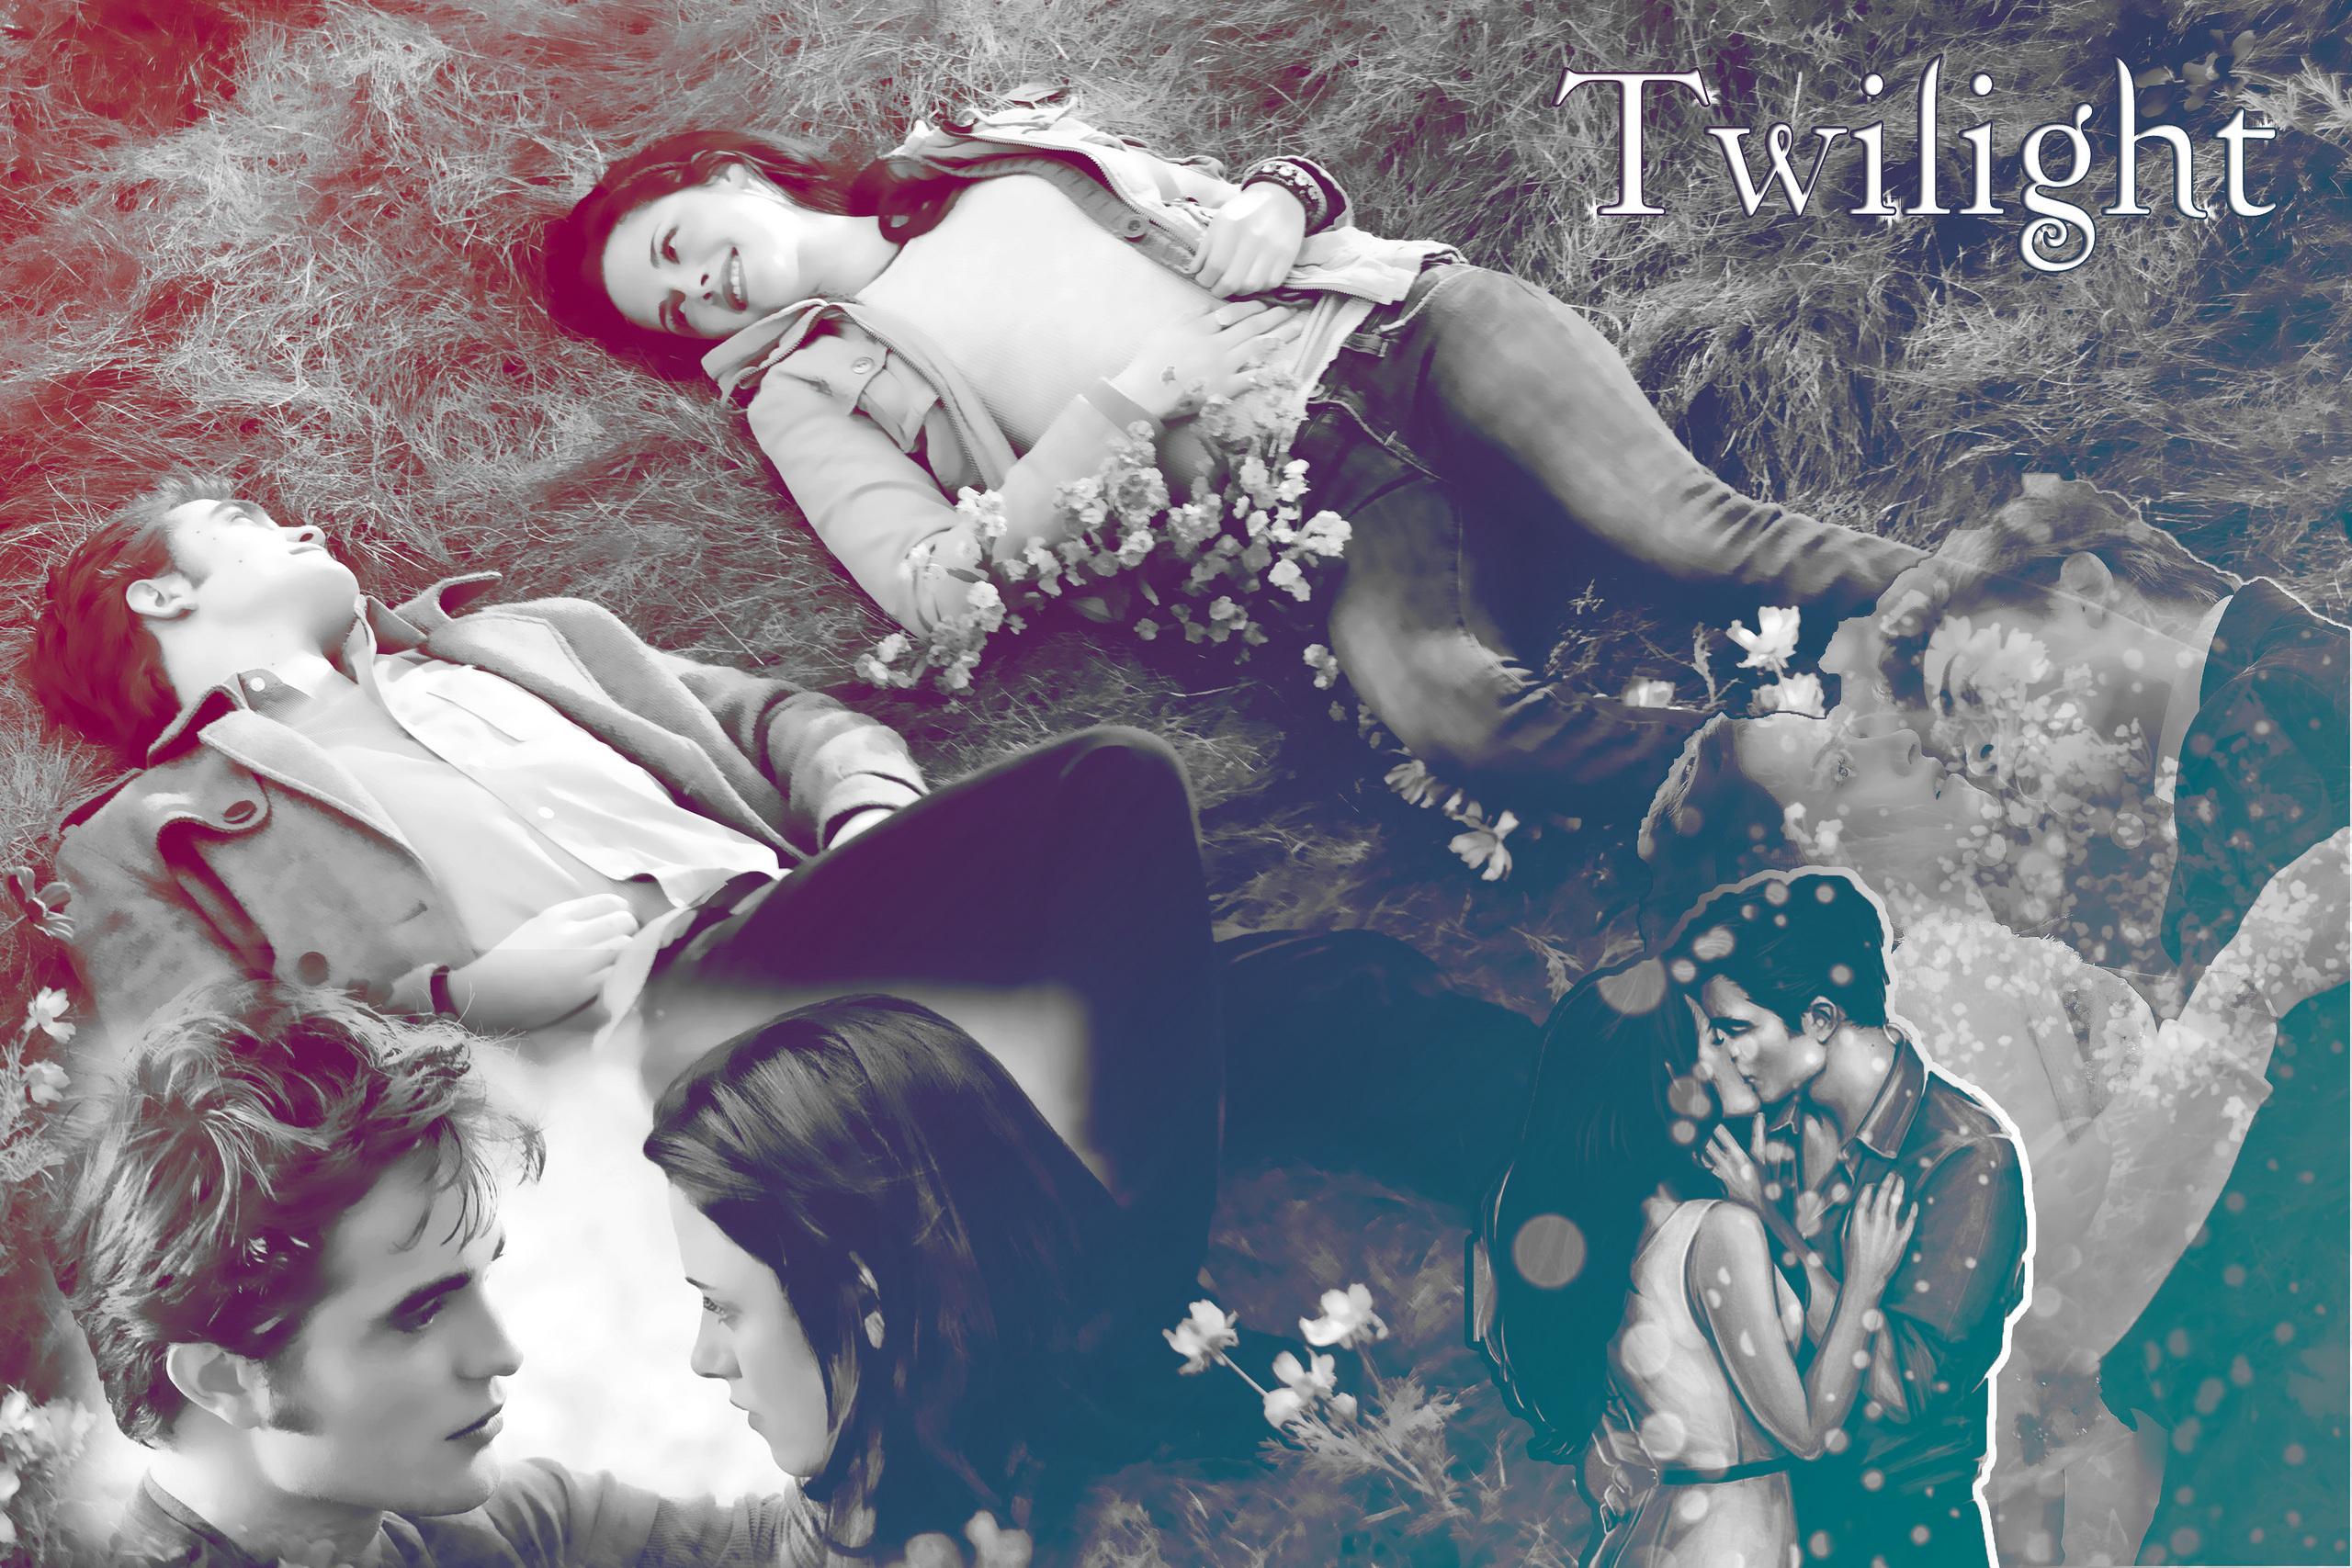 Twilight's achtergrond